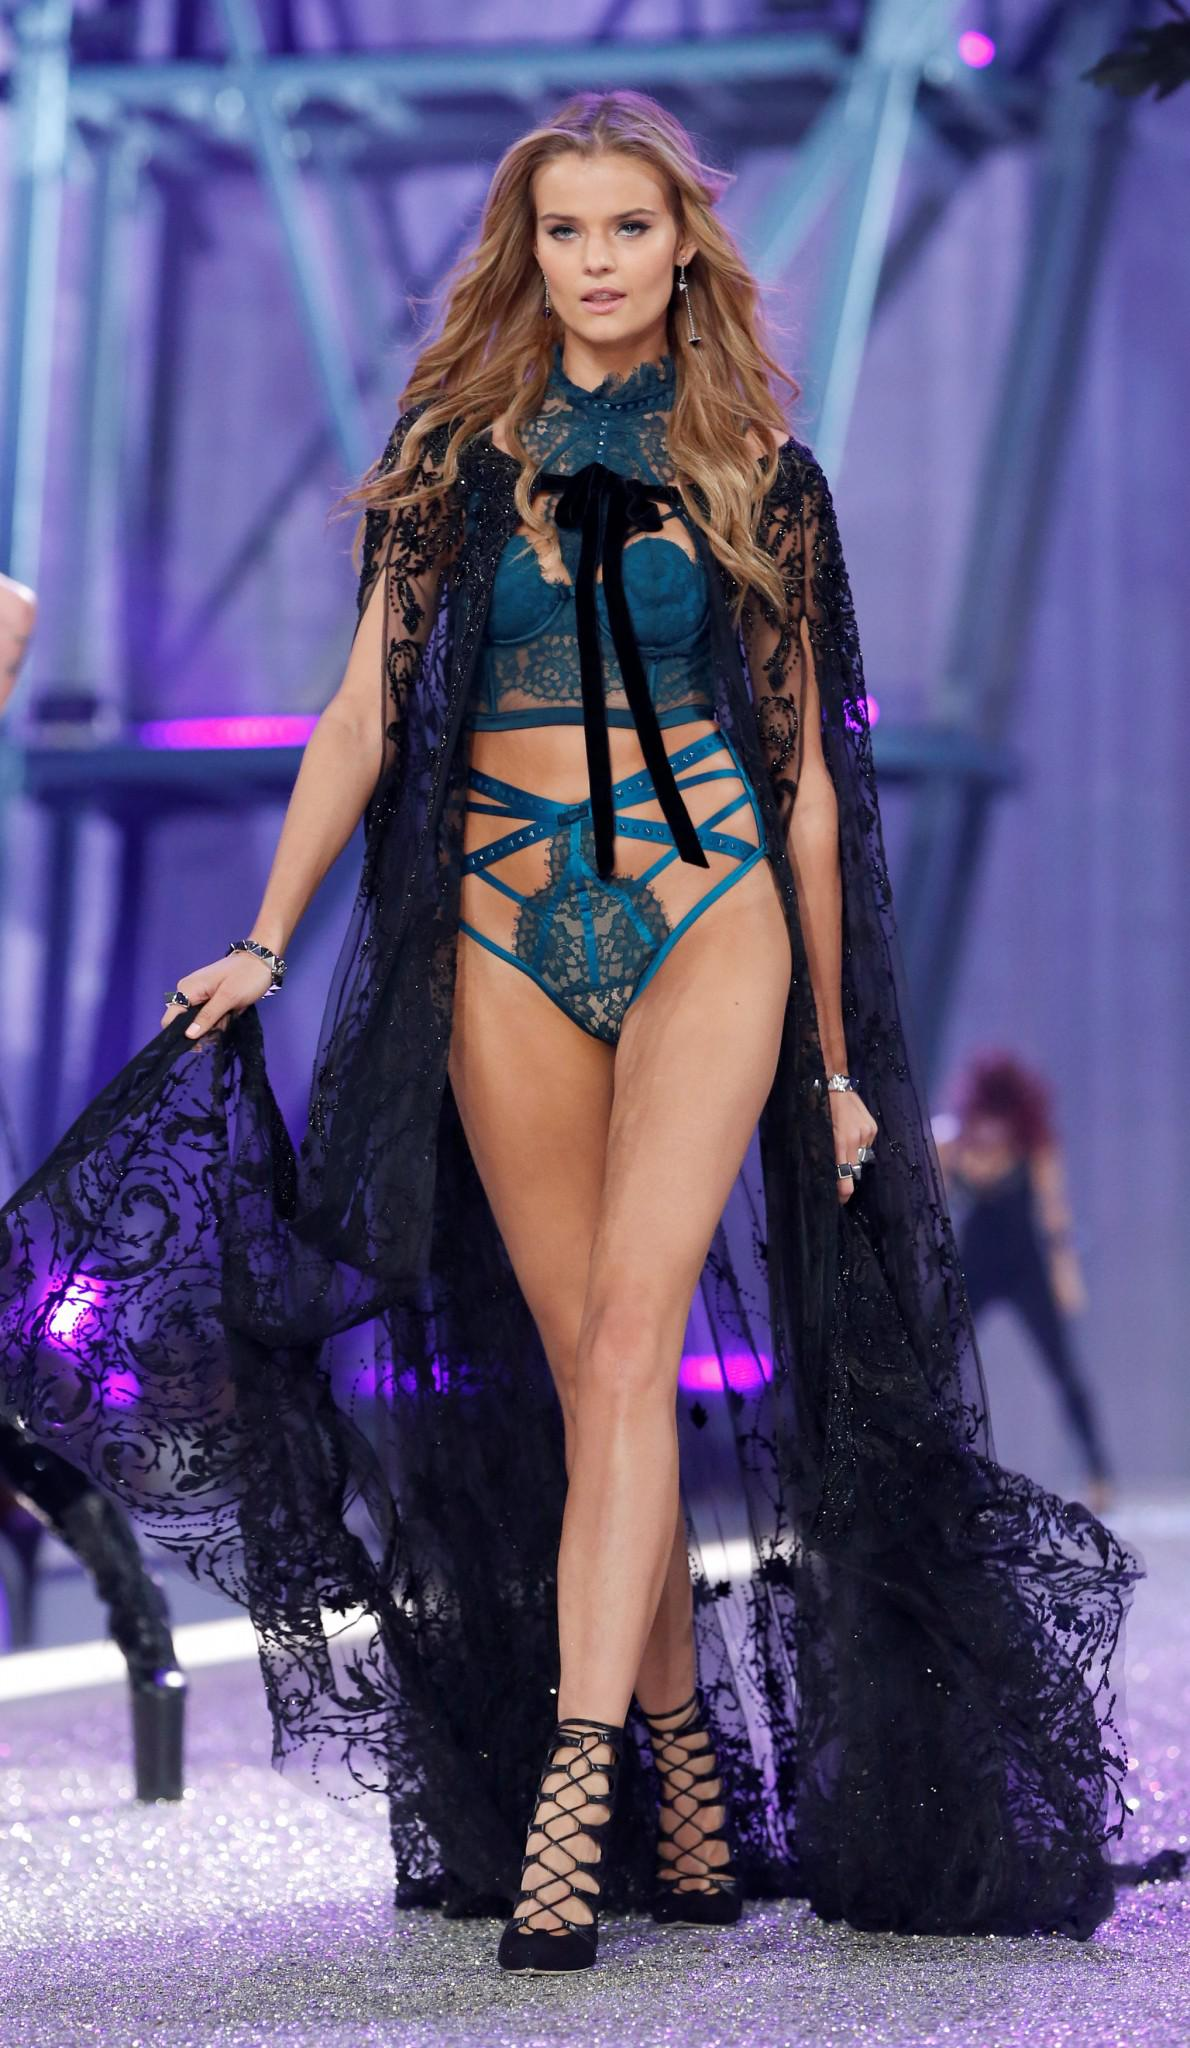 Victoria-Secret-show-esorouxa-modela-1300-18 Το show της Victoria's Secret που «κόλασε» το Παρίσι με τα αγγελάκια της